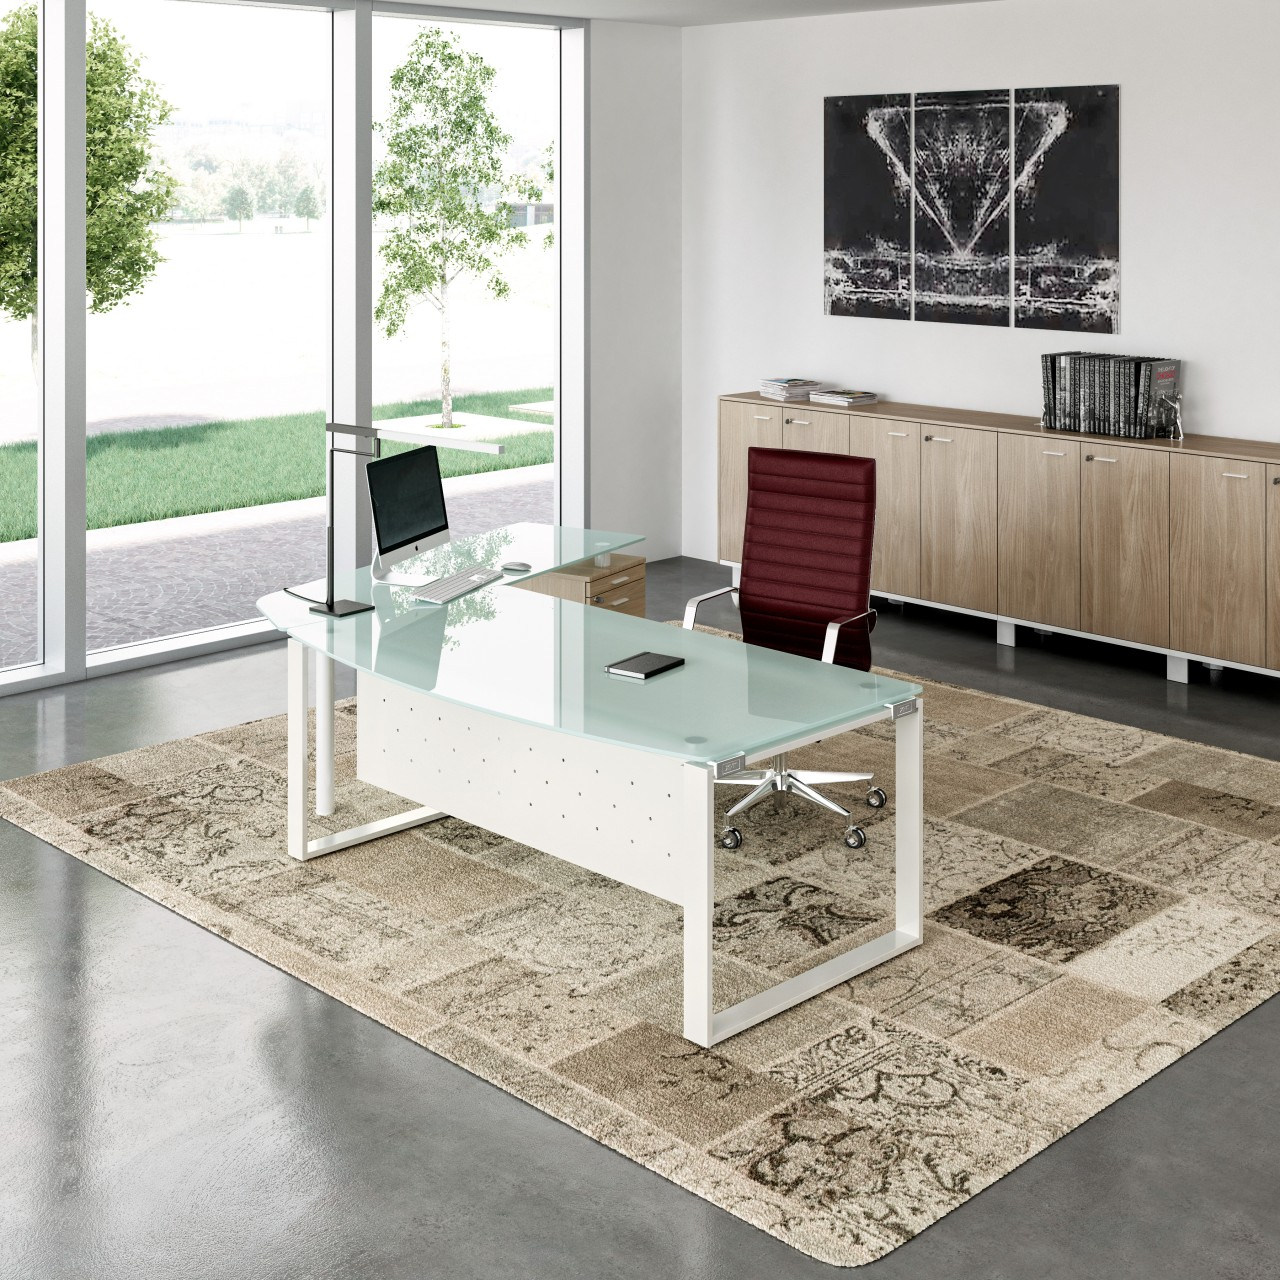 bureau en verre x time manager achat bureau design 2 199 00. Black Bedroom Furniture Sets. Home Design Ideas